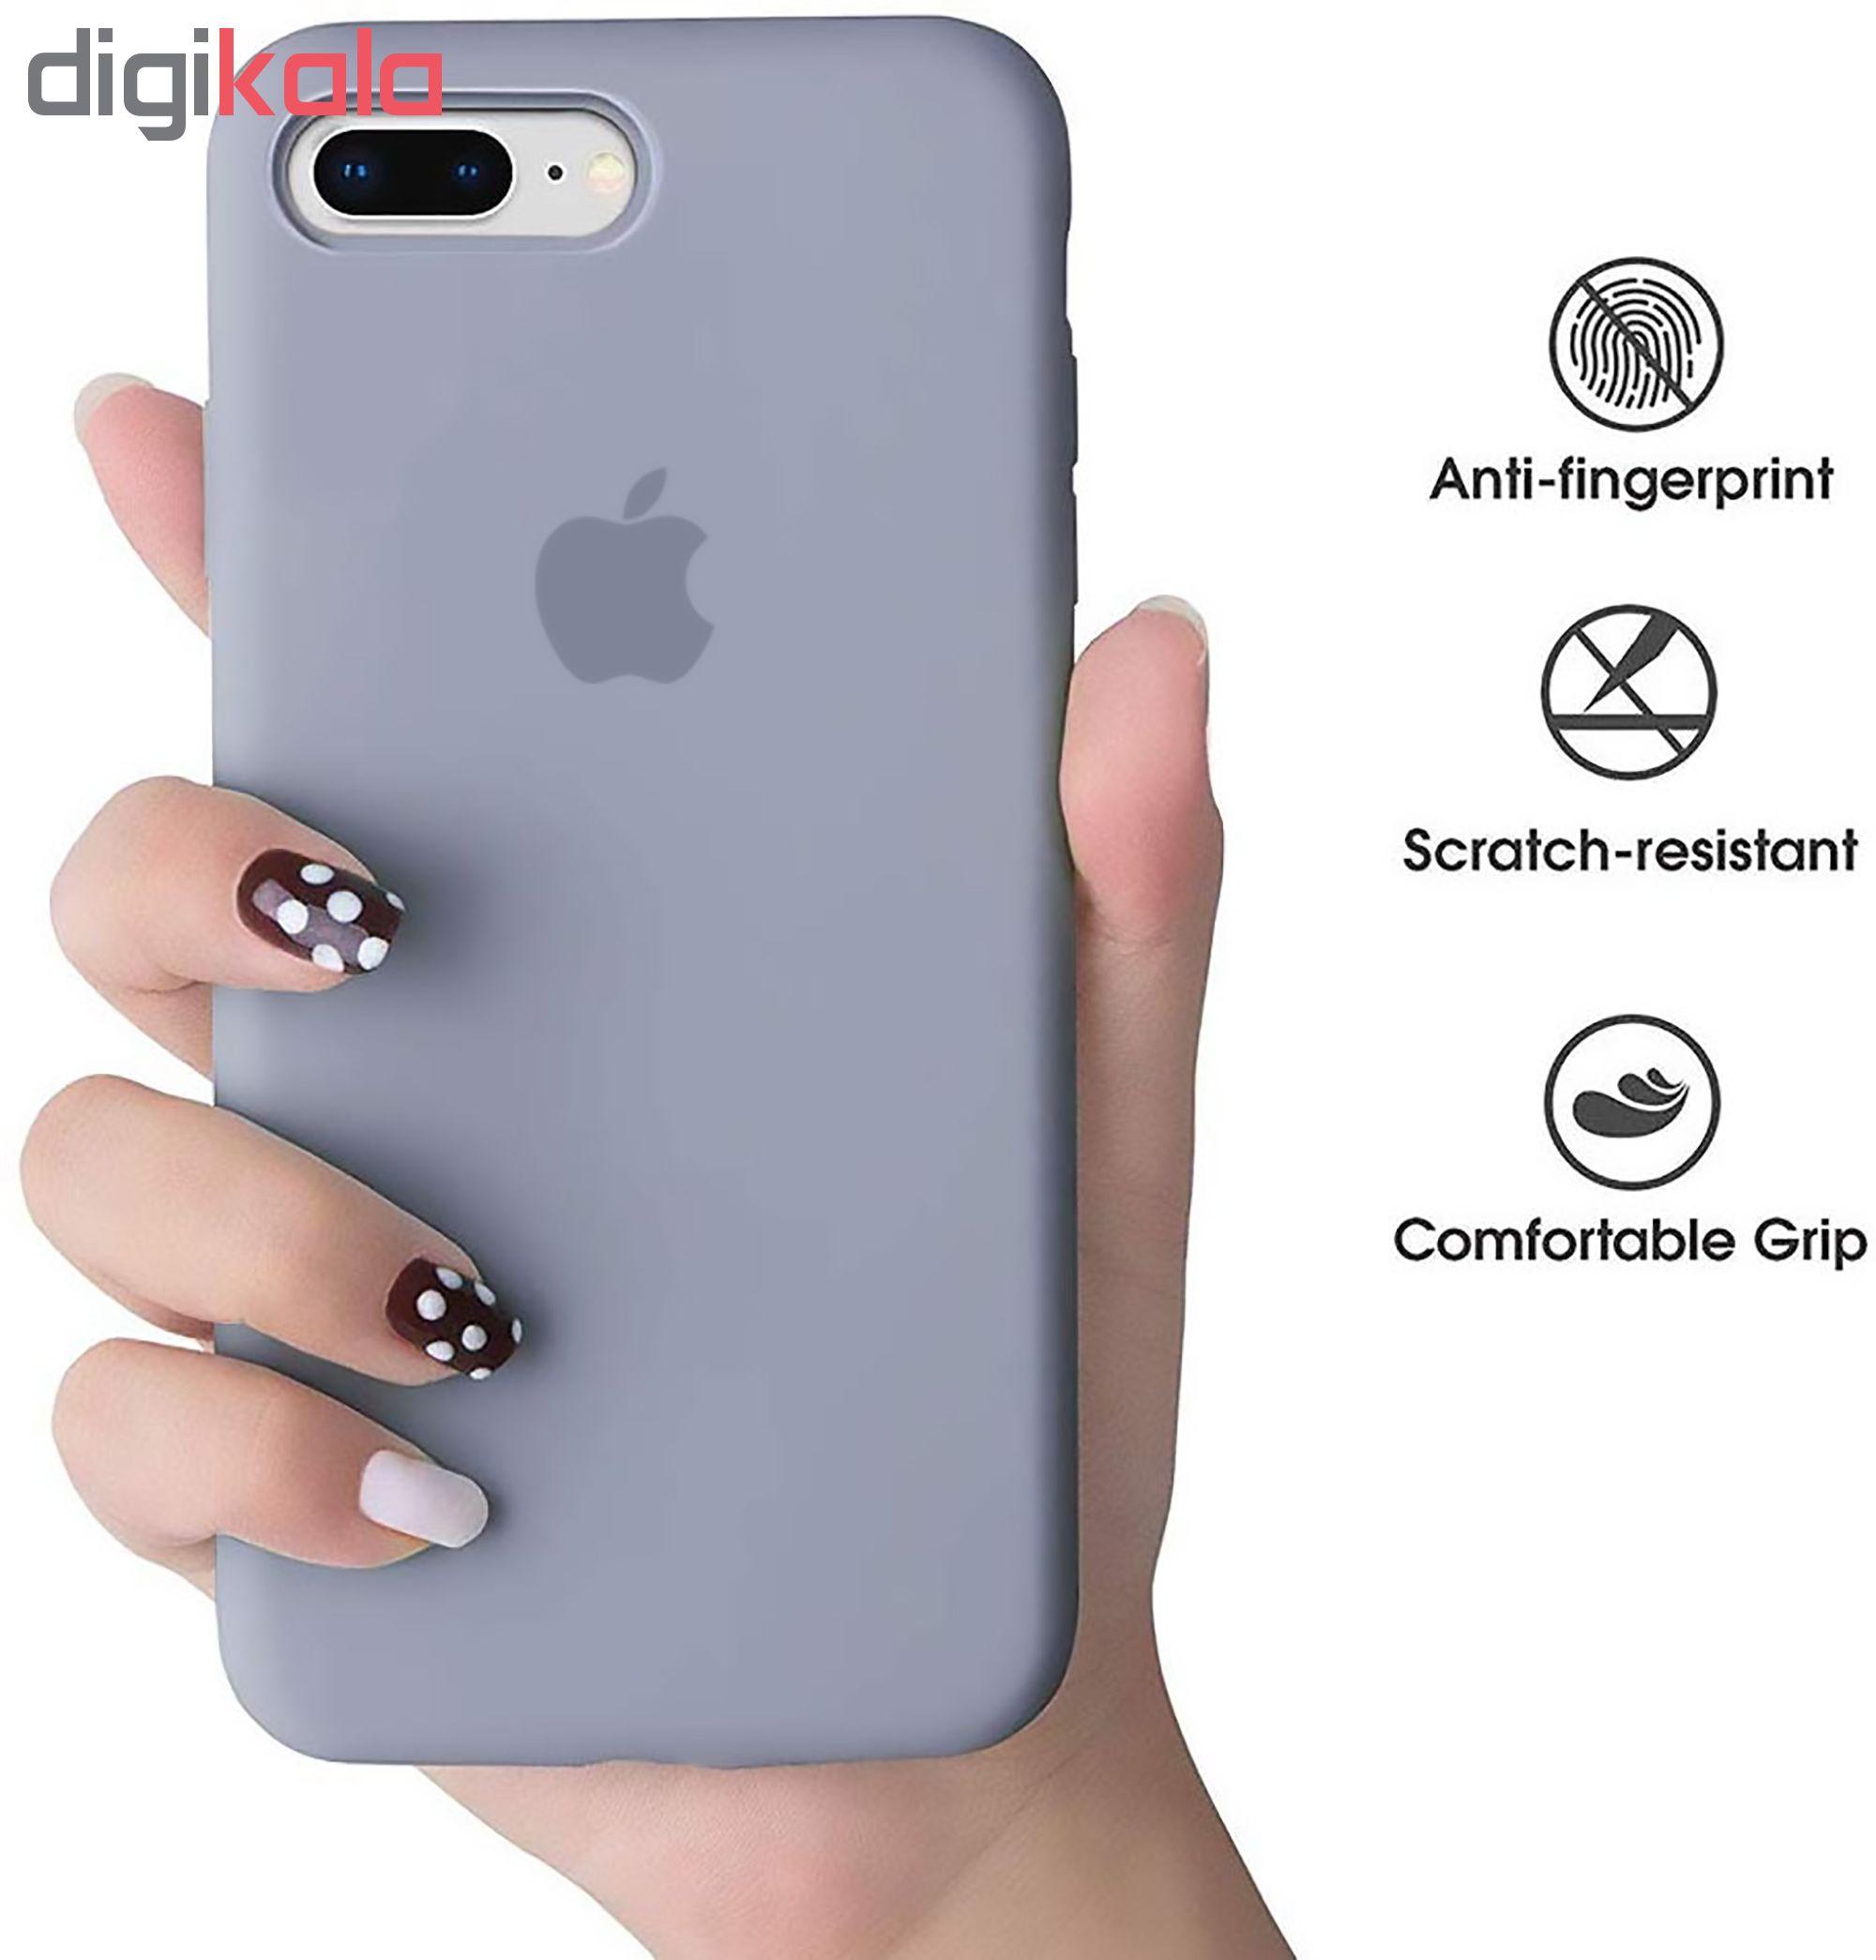 کاور مدل Silc مناسب برای گوشی موبایل اپل  Iphone 8 plus / iphone 7plus main 1 13